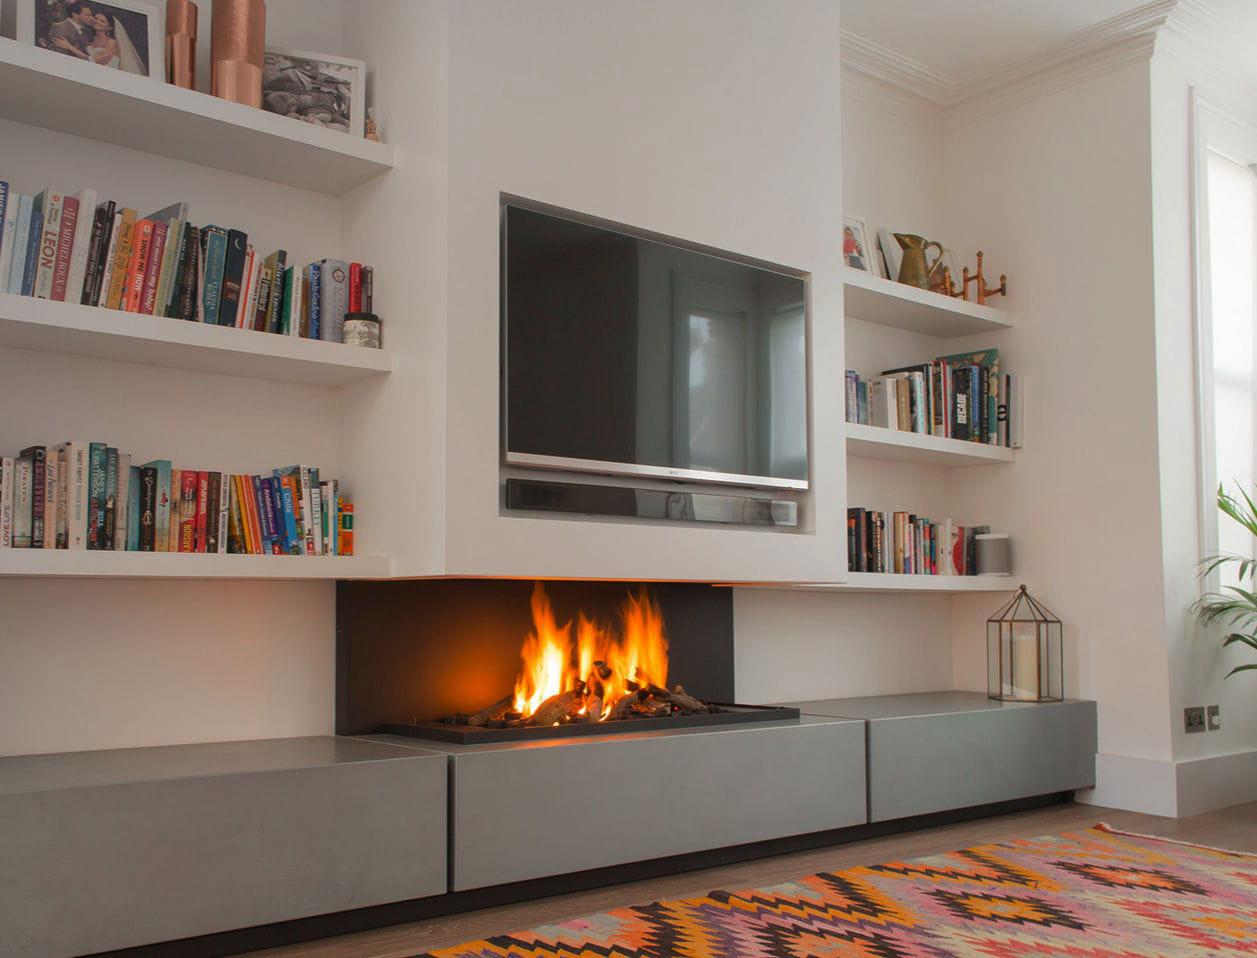 Colocar tv encima chimenea infografia blog - Chimenea electrica mueble ...